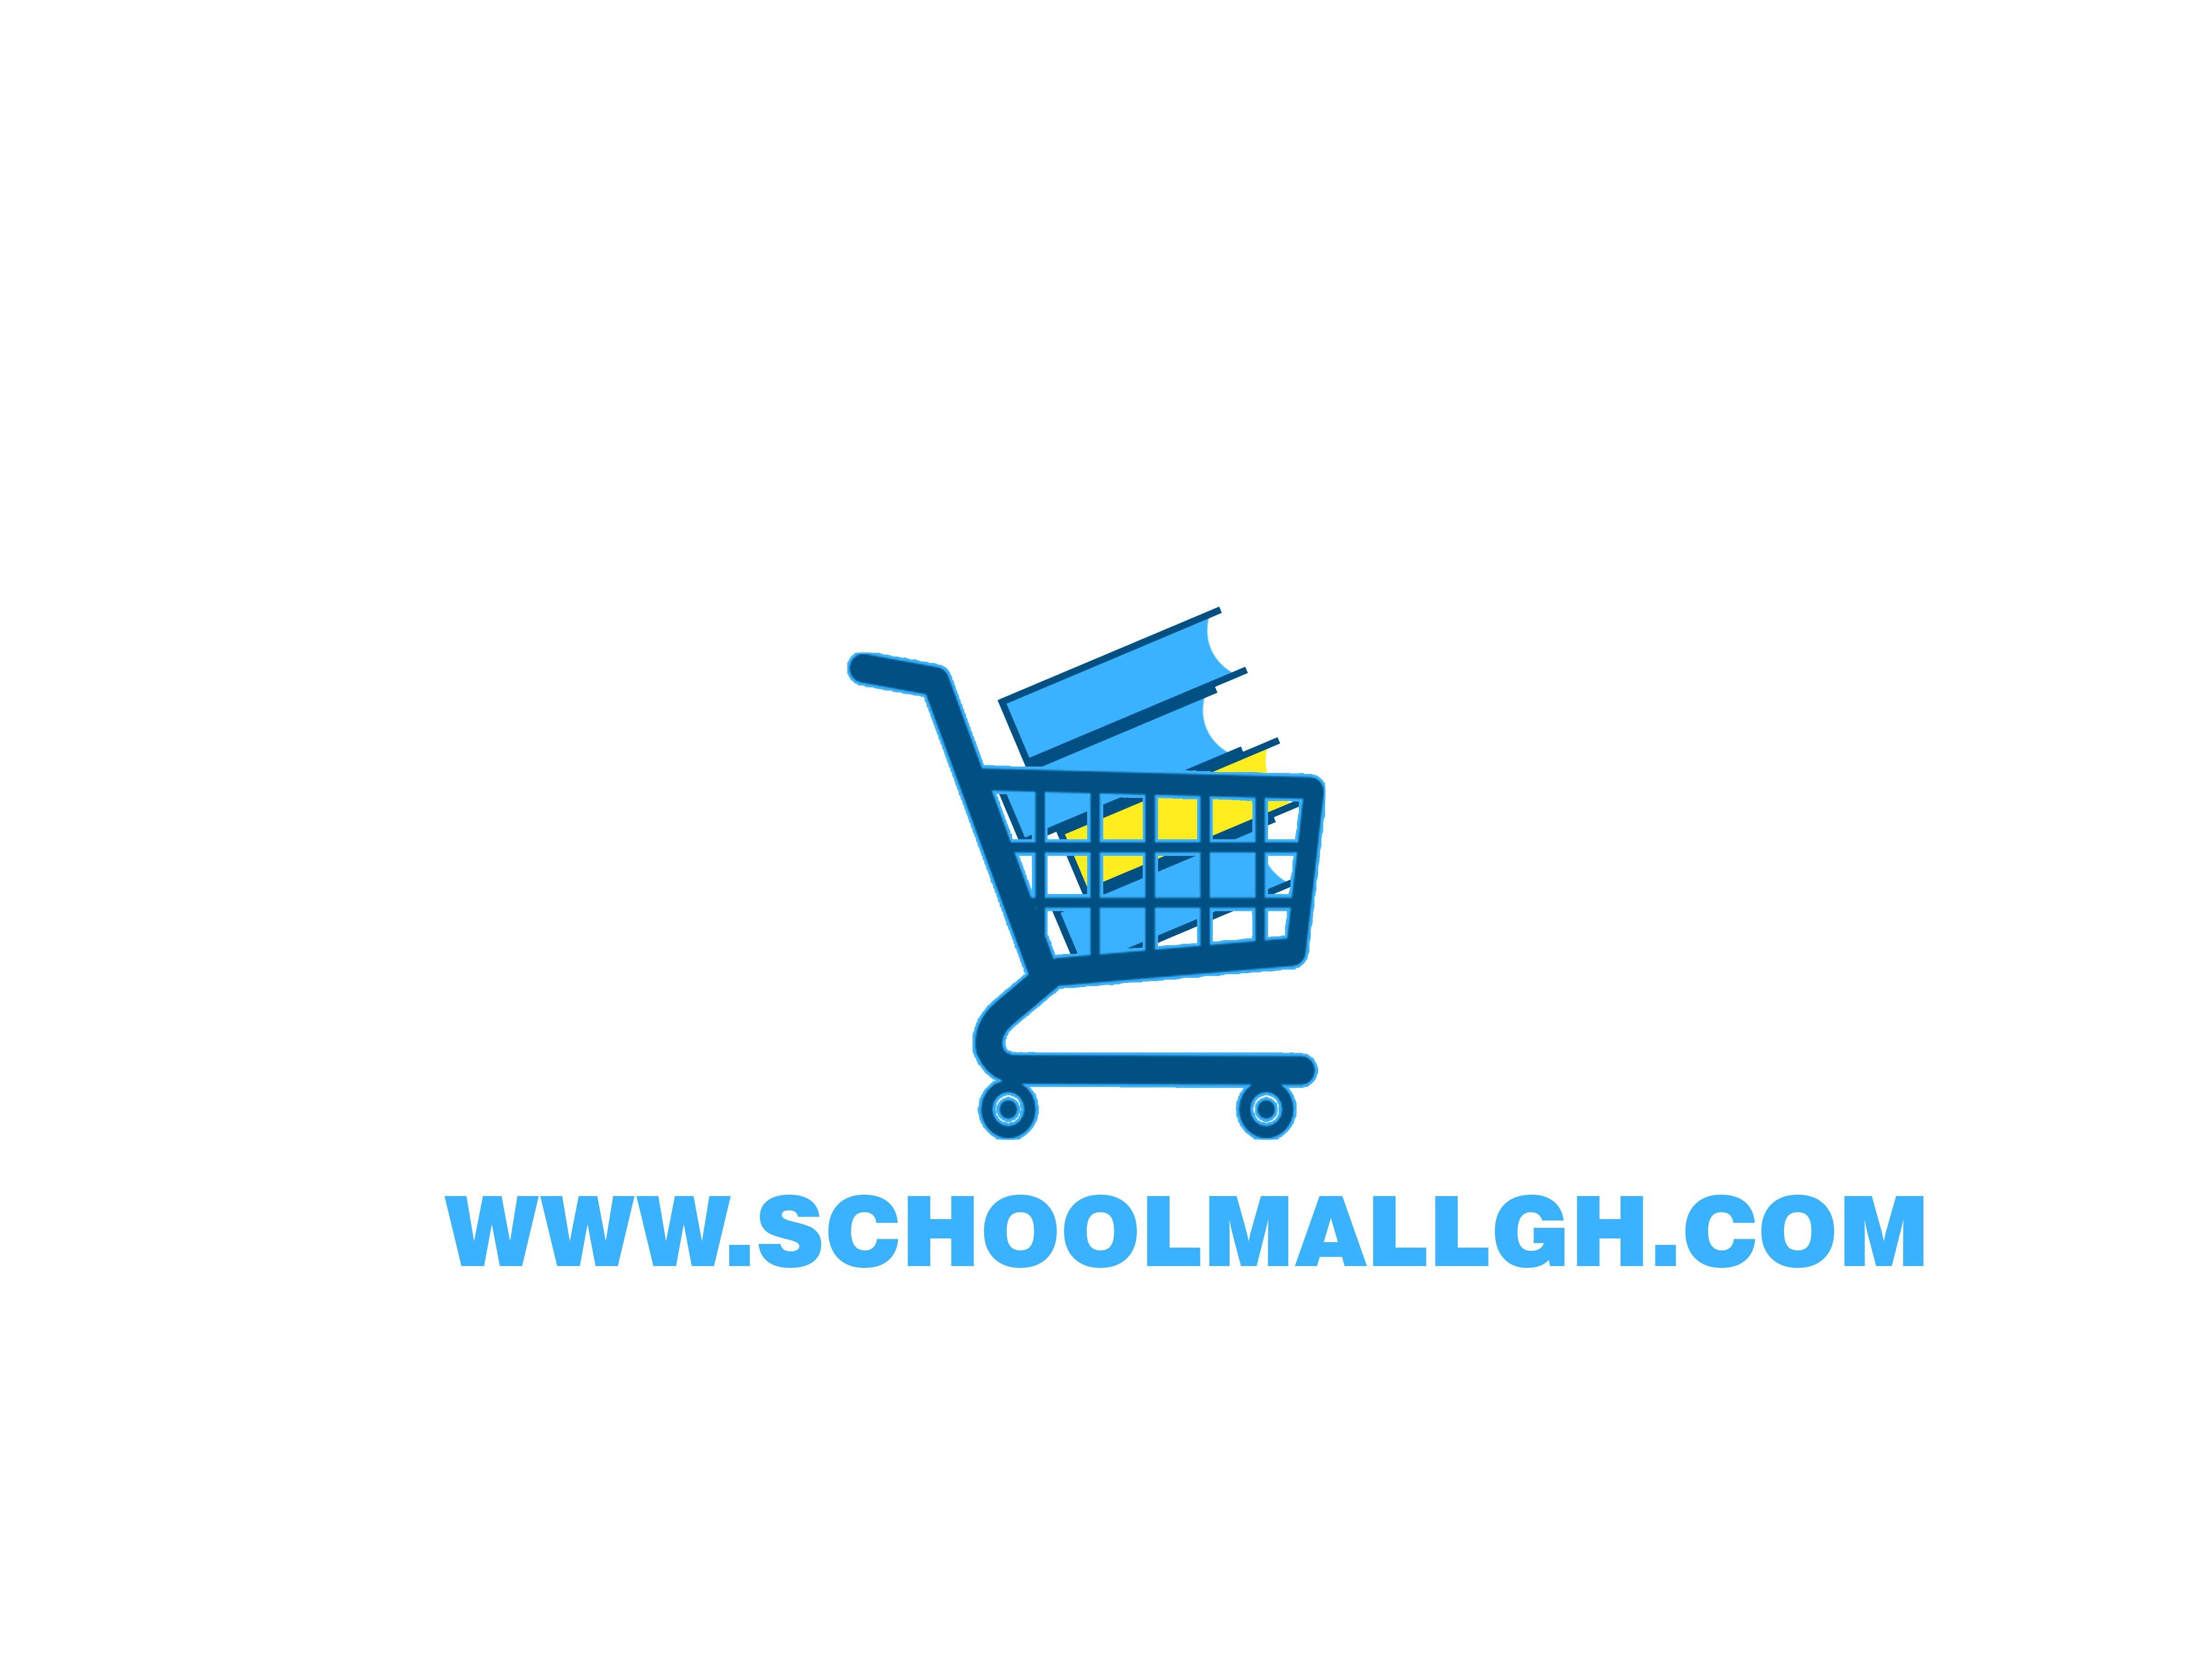 Schoolmallgh